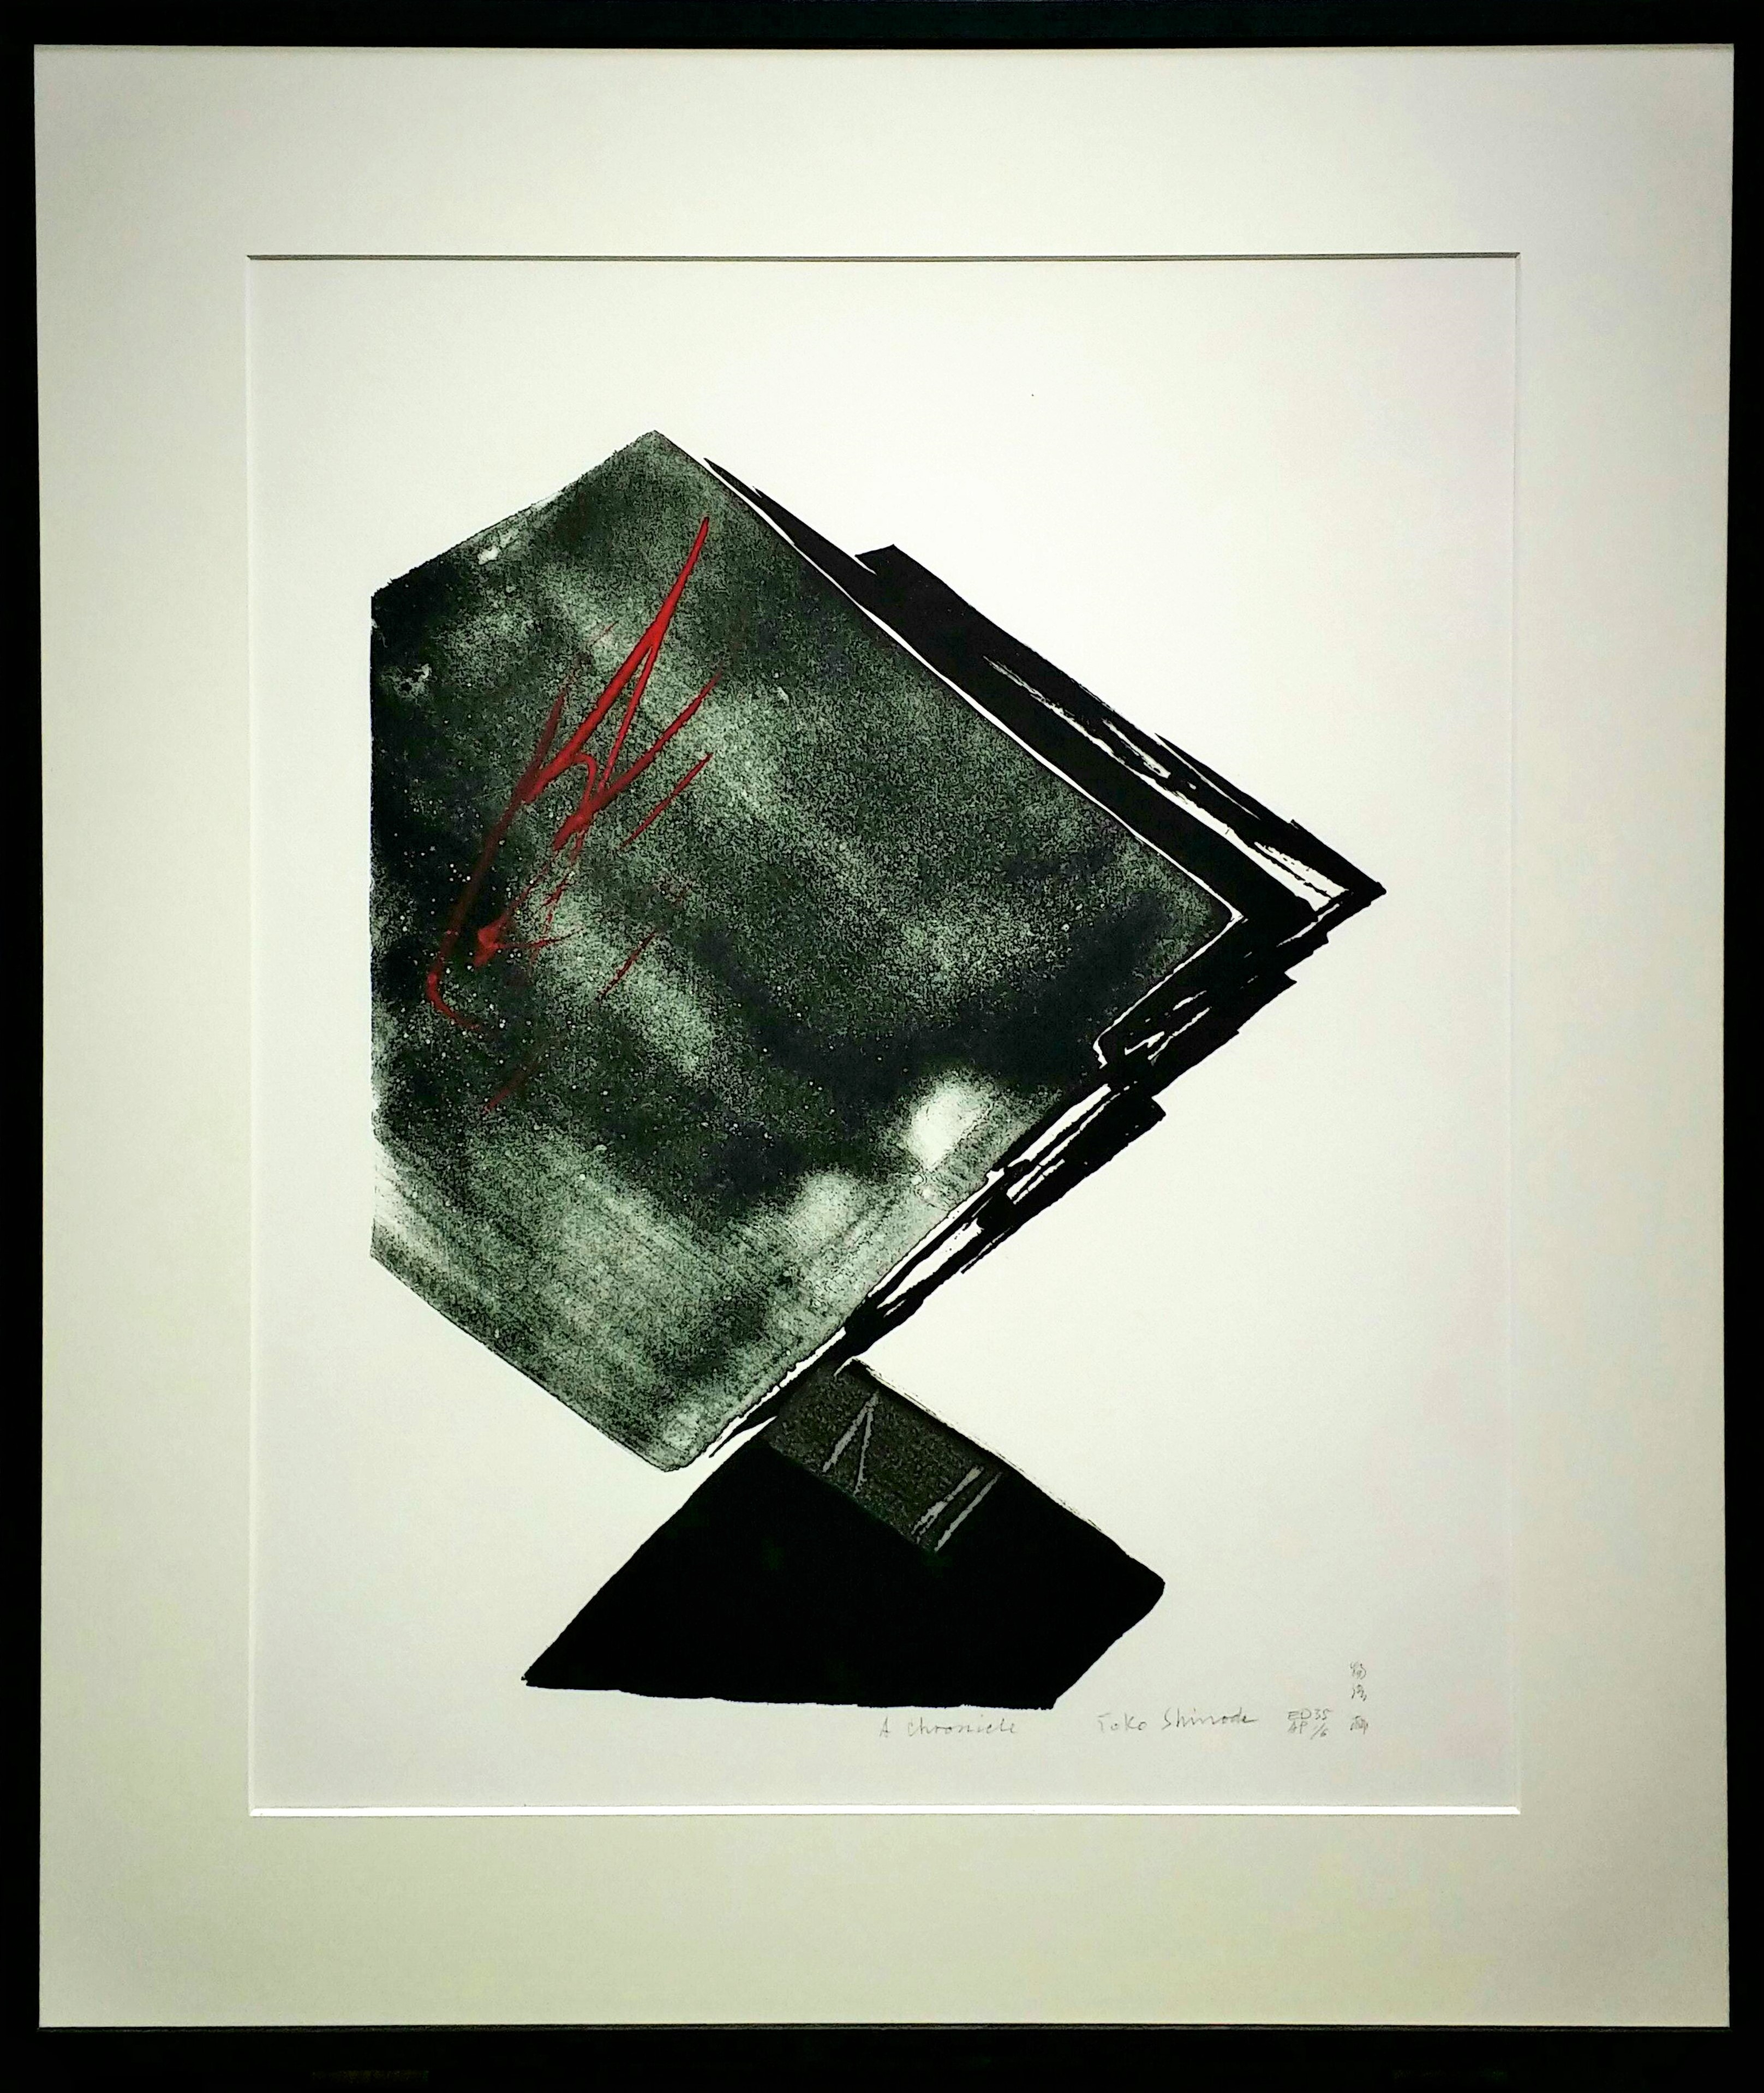 A-Chronicle」手彩色リトグラフ57.9×47.6cm2.jpg